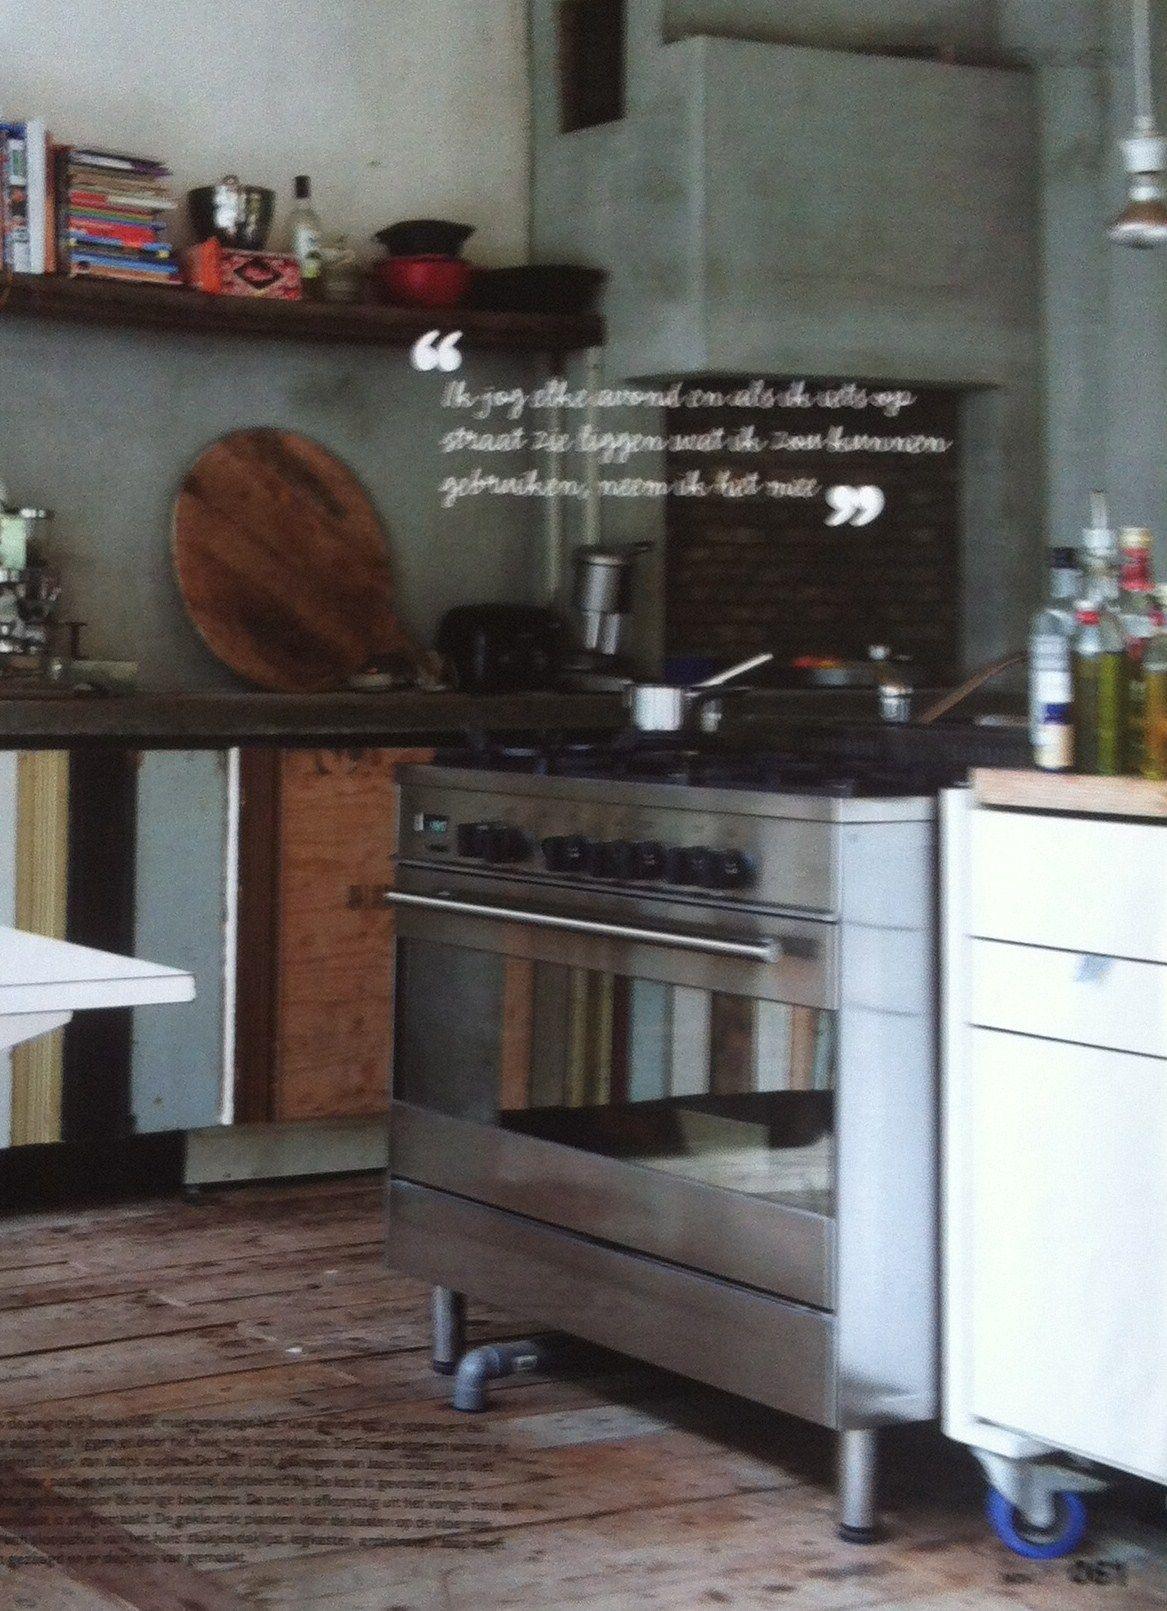 Keuken van sloophout 3 1 keuken home pinterest for Keuken van sloophout